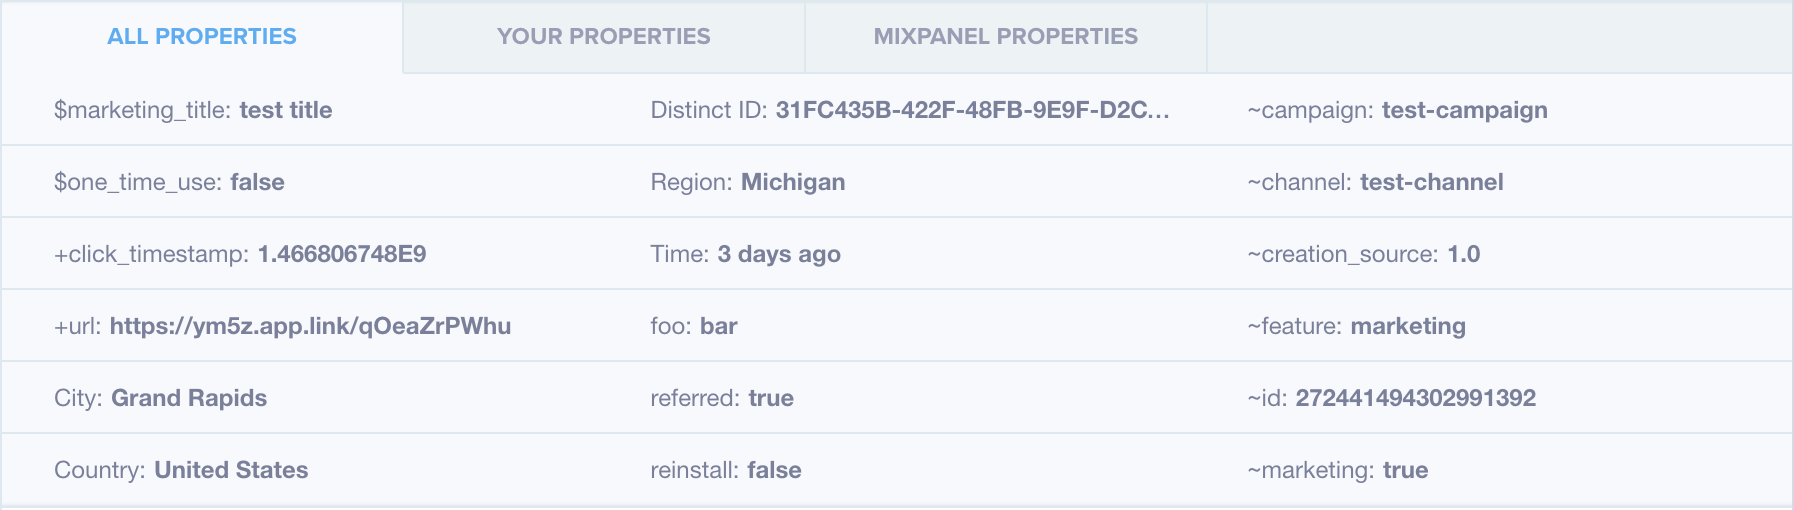 Mixpanel - Branch Docs